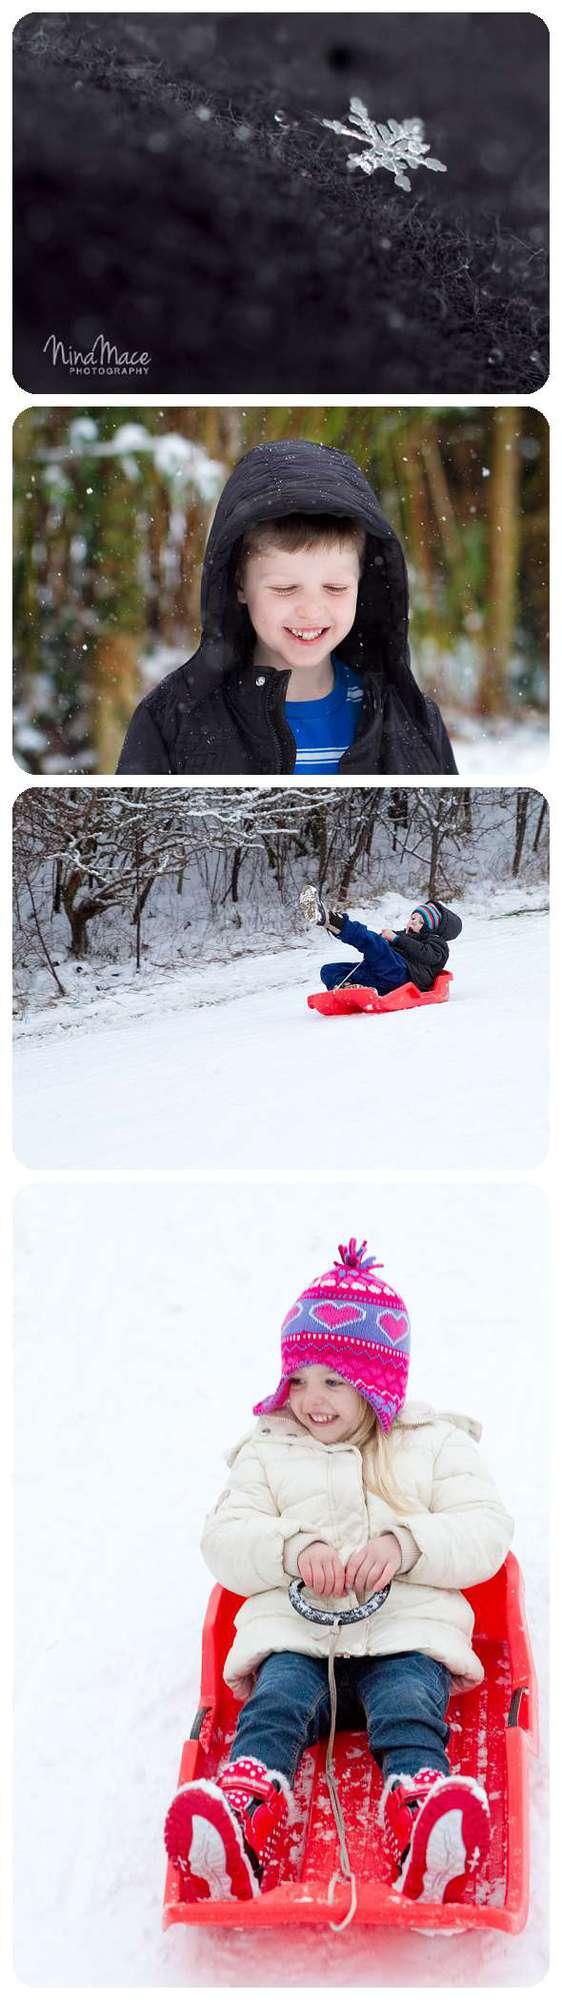 macro snowflake and snow day in Hemel Hempstead